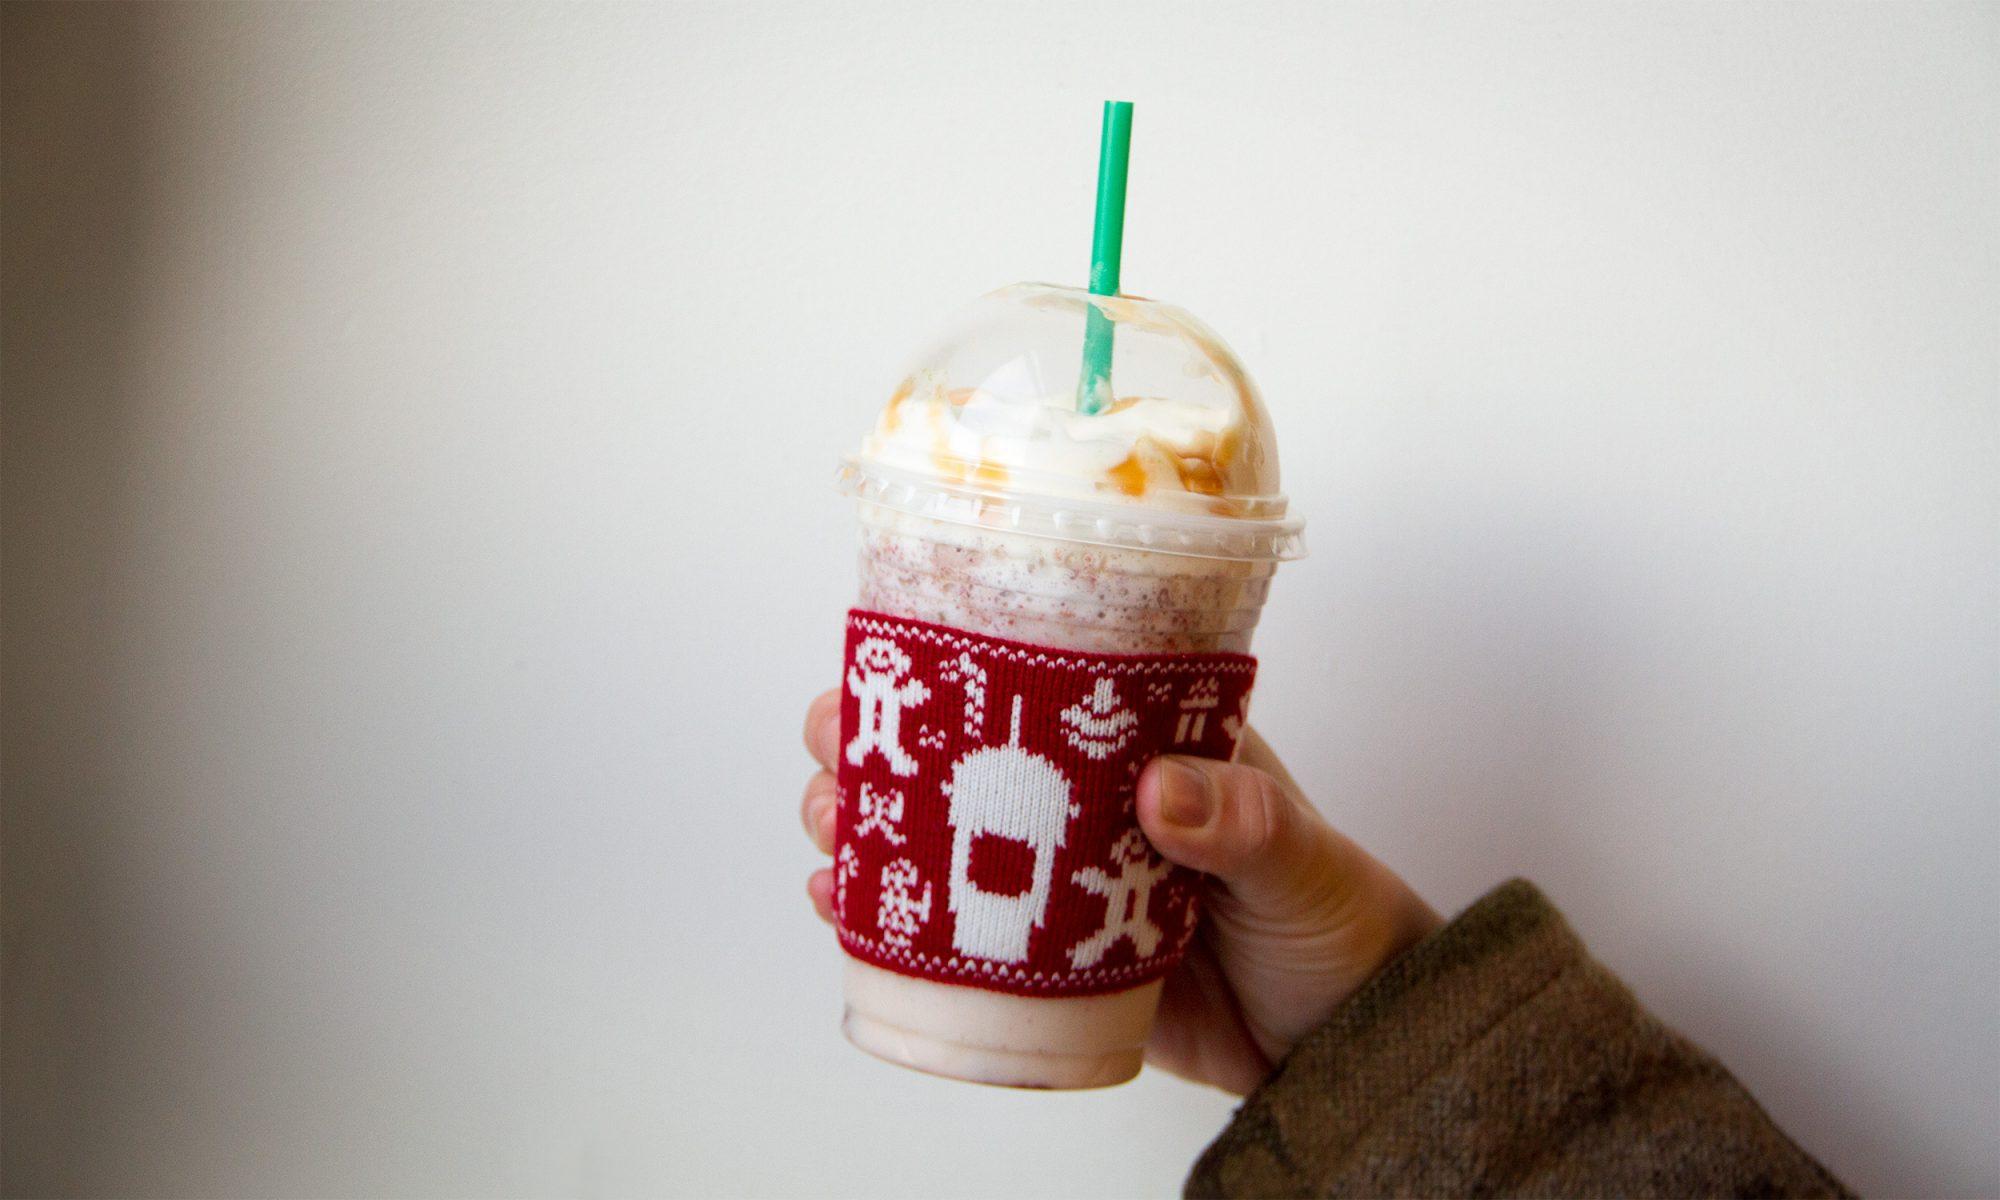 EC: Starbucks' Fruitcake Frappuccino Tastes Like, Well, Fruitcake